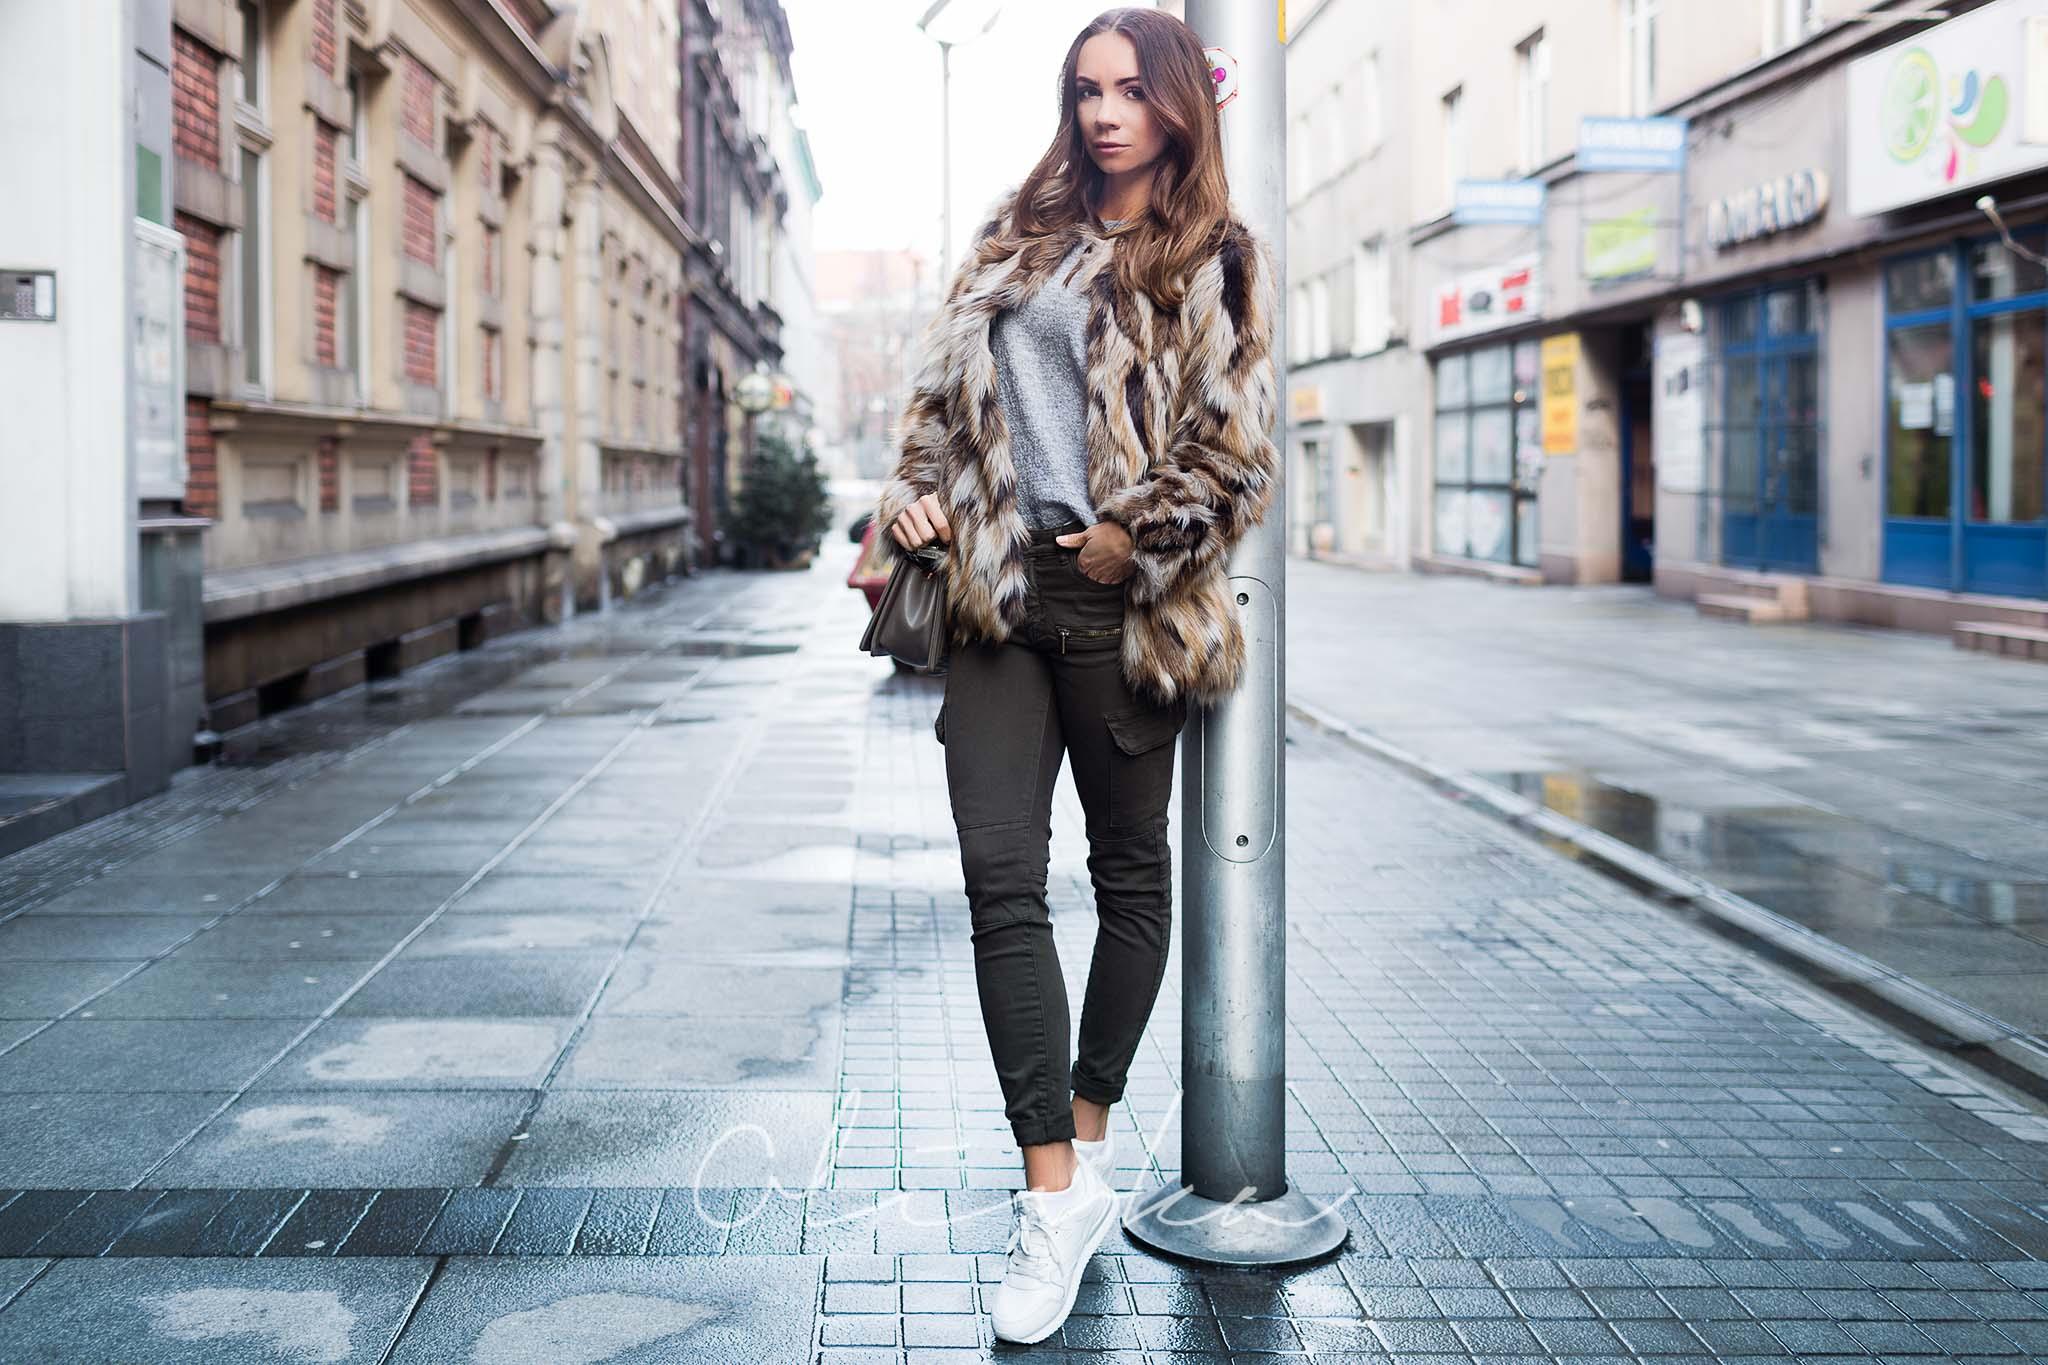 20_02_16_copyright 2015 olivkablog.pl_Mix na bloga-1